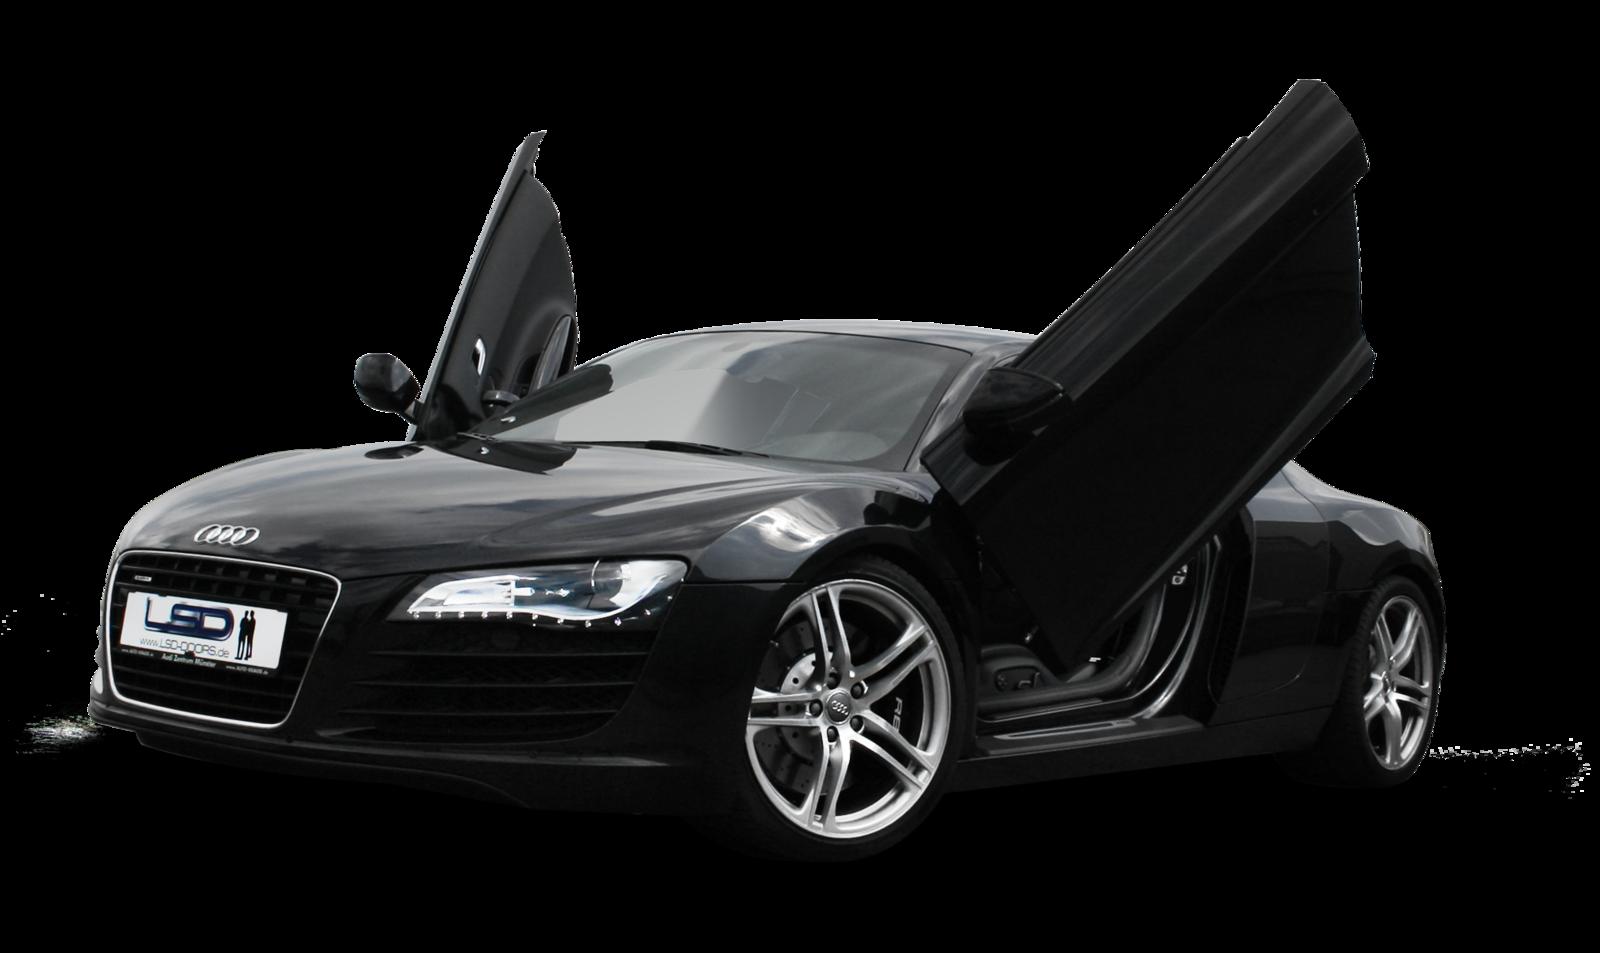 Audi Png Image Purepng Free Transparent Cc0 Png Image Library